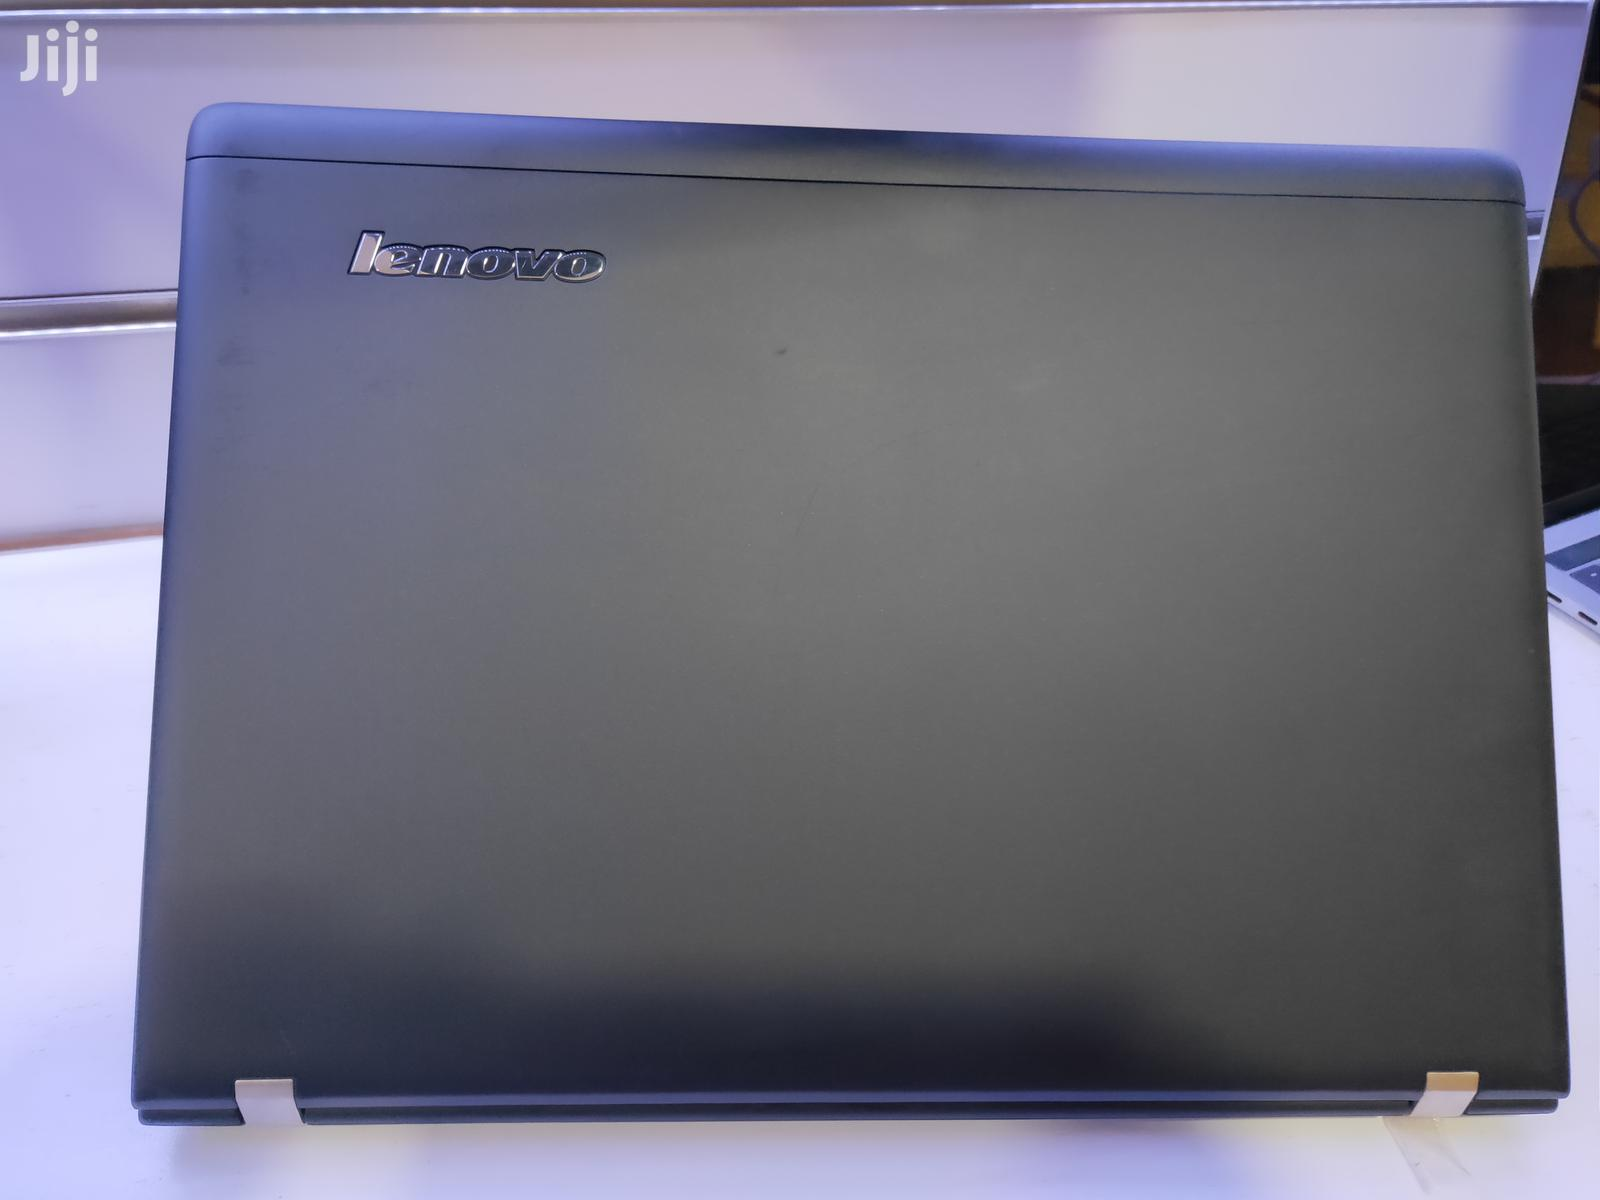 Laptop Lenovo 8GB Intel Core I7 SSHD (Hybrid) 1T | Laptops & Computers for sale in Kampala, Central Region, Uganda